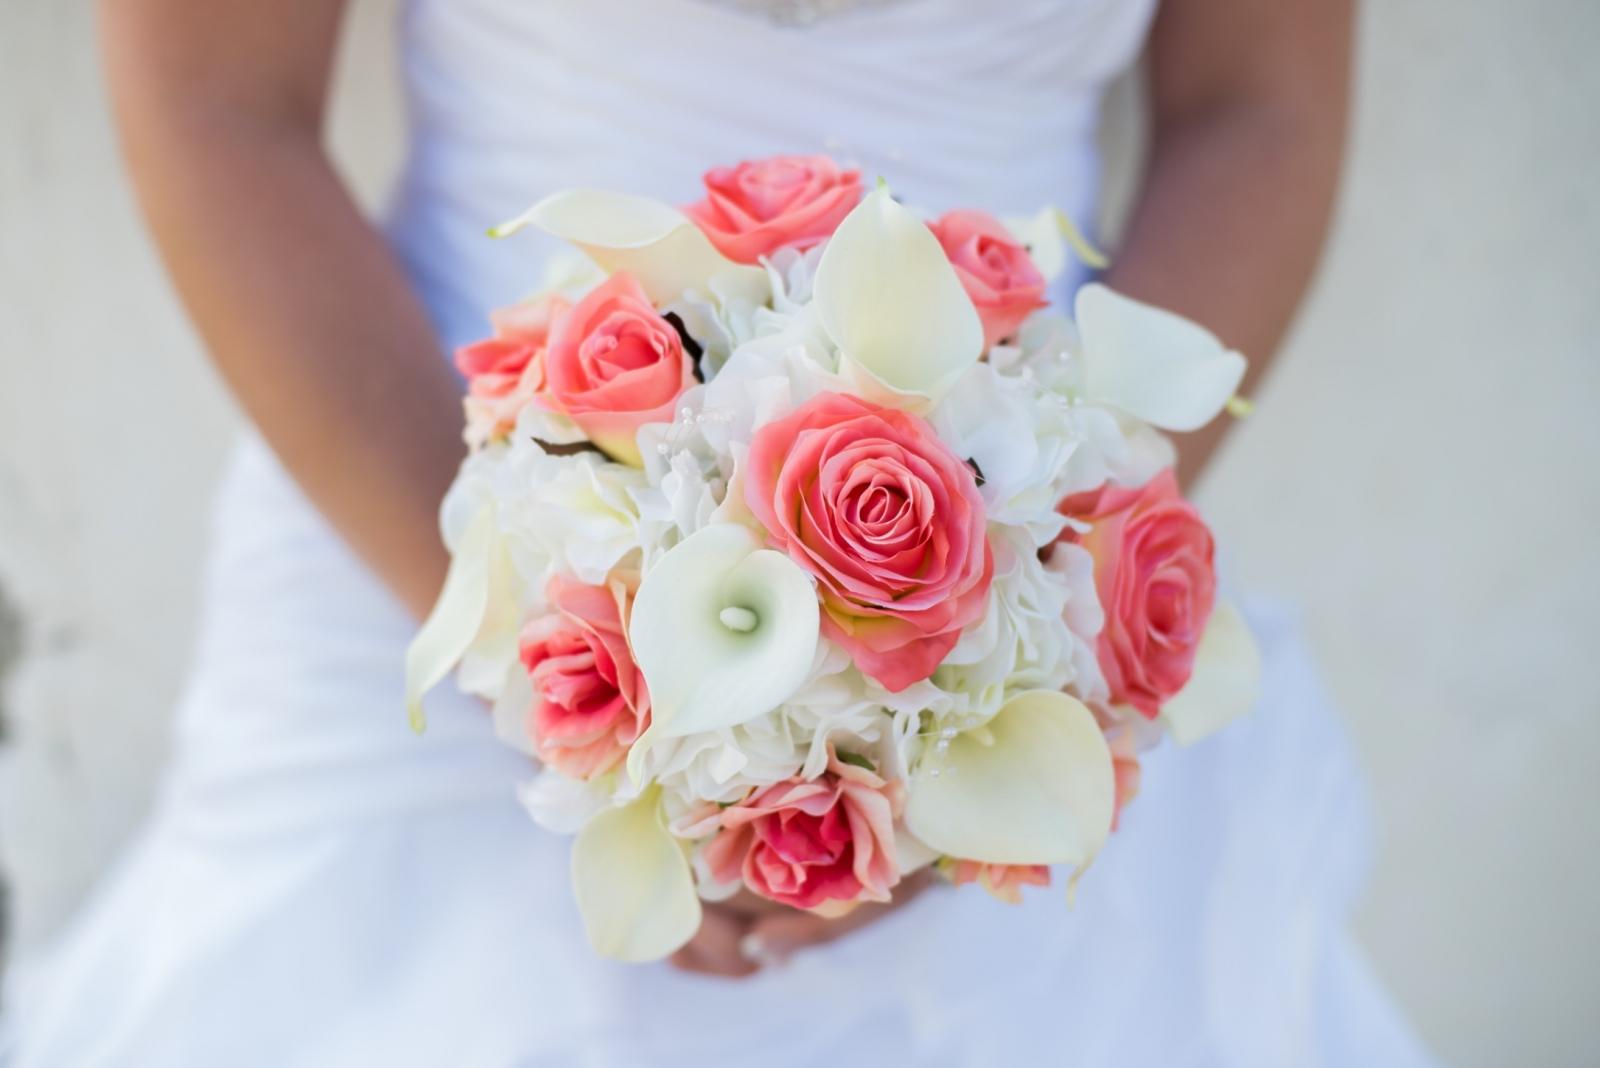 silk calla lily wedding bouquets photo - 1